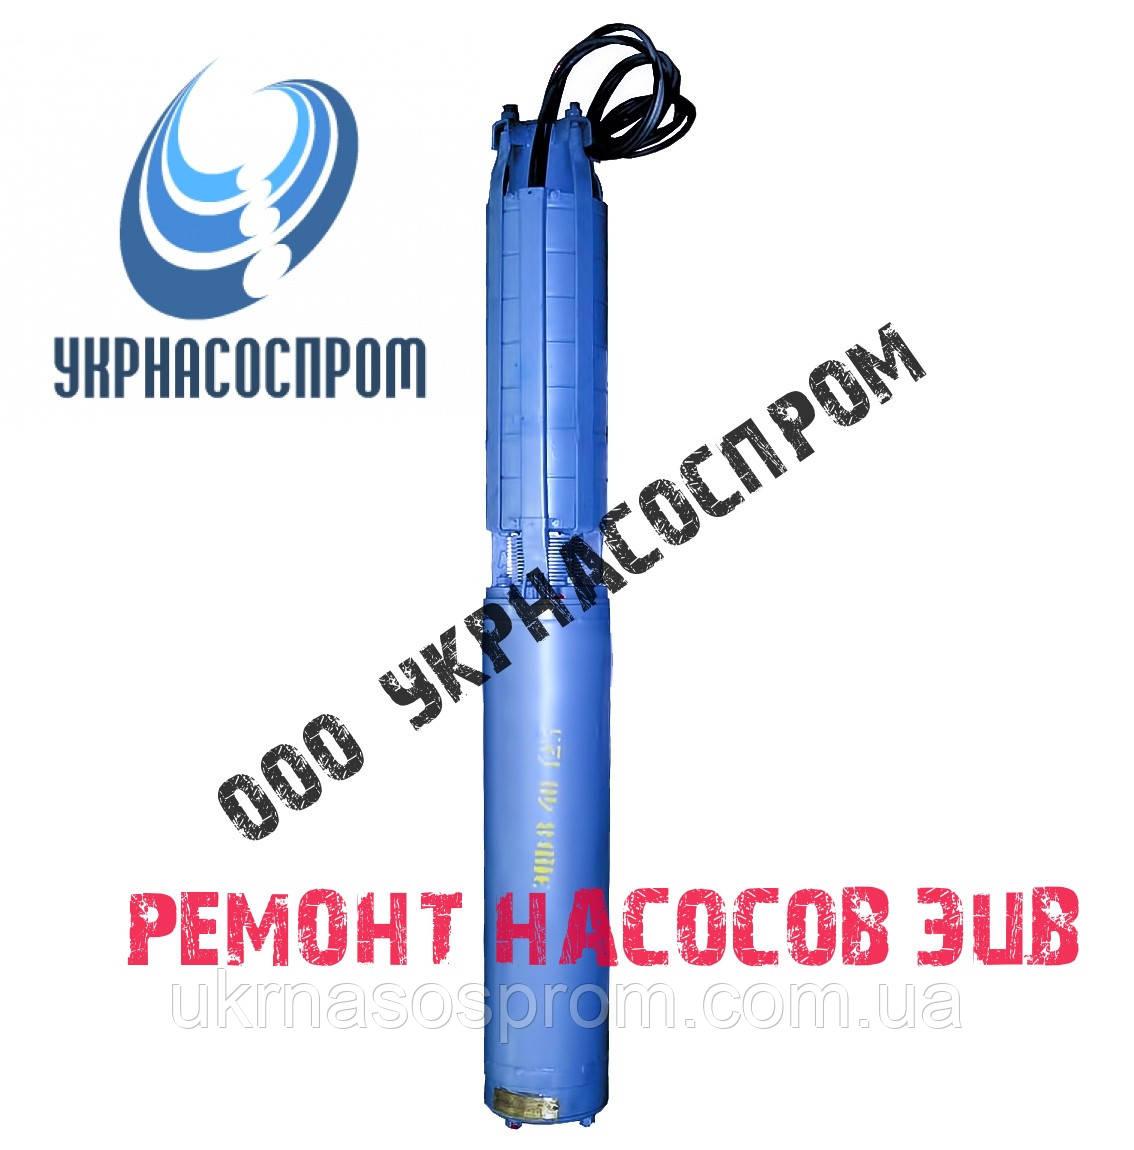 Ремонт насоса ЭЦВ 8-25-300